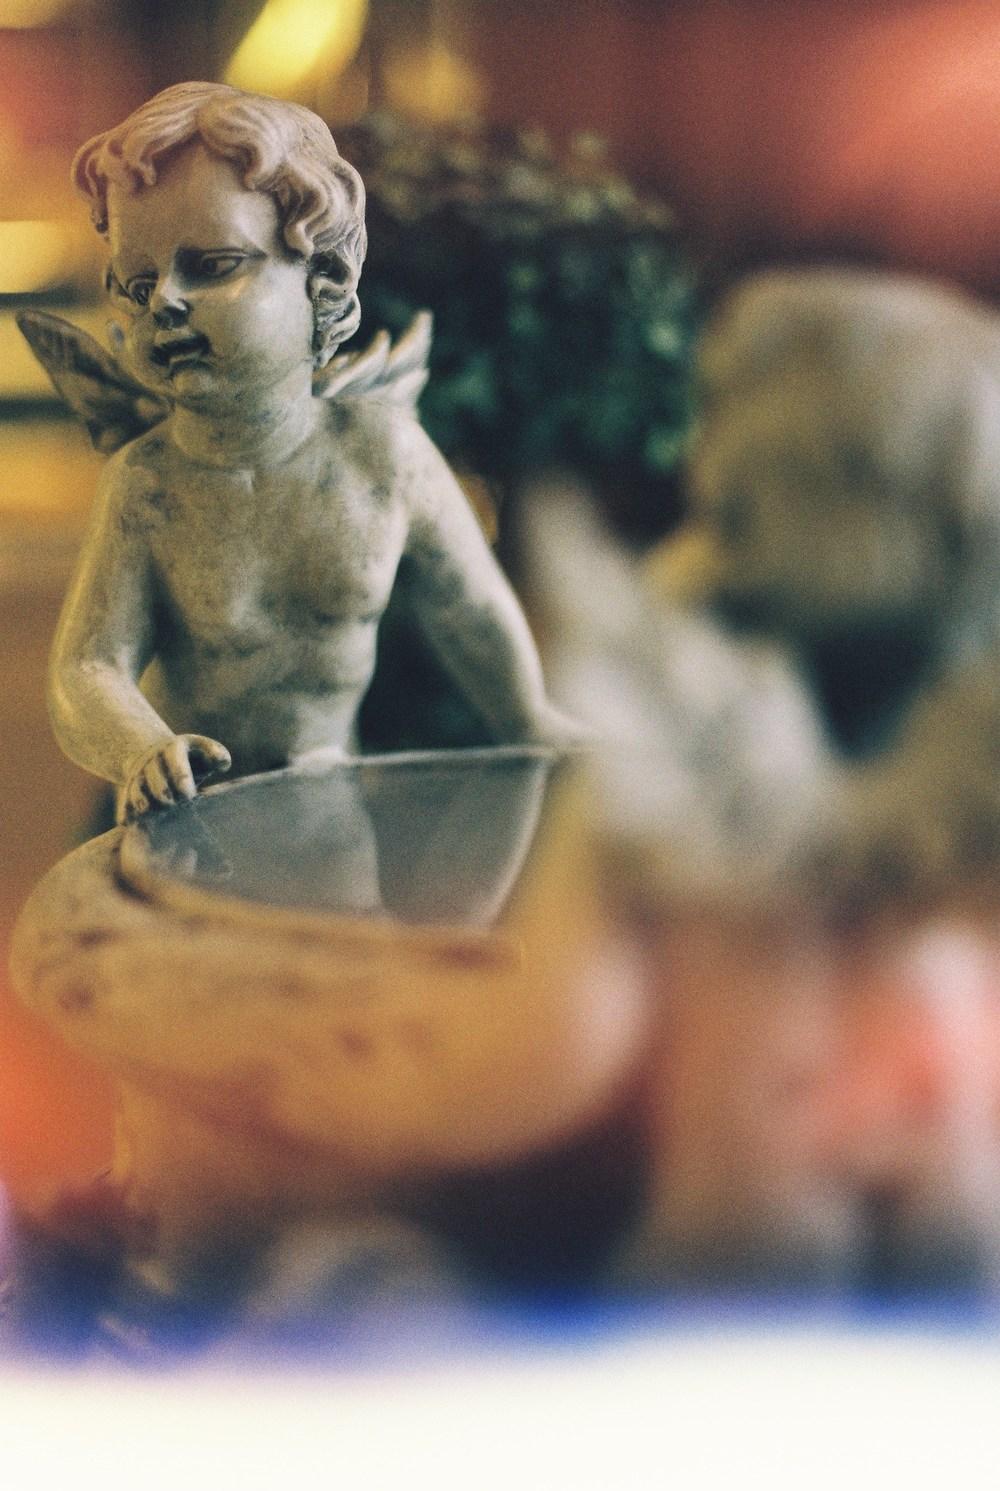 penang-film-photography-30.jpg